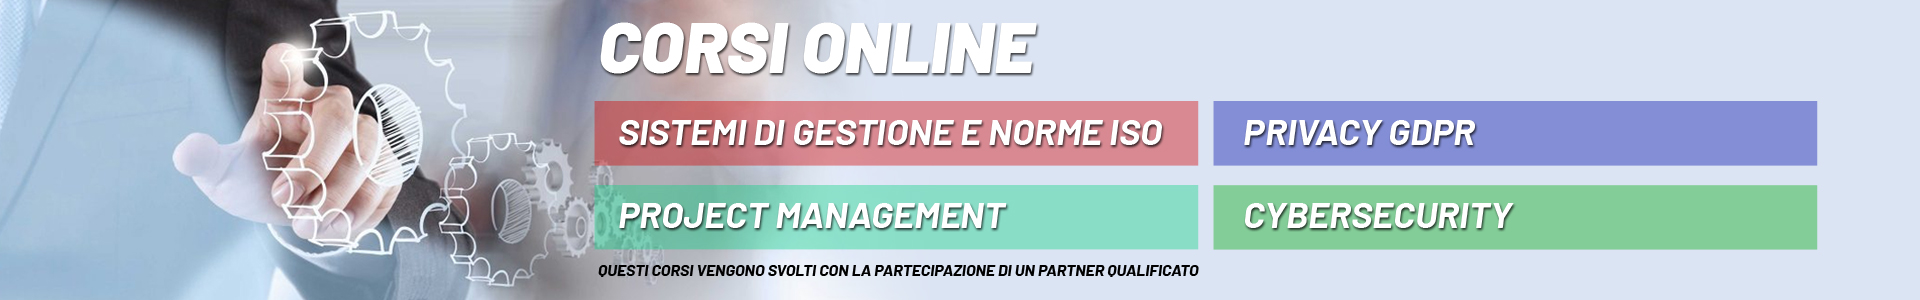 Corsi online ISO